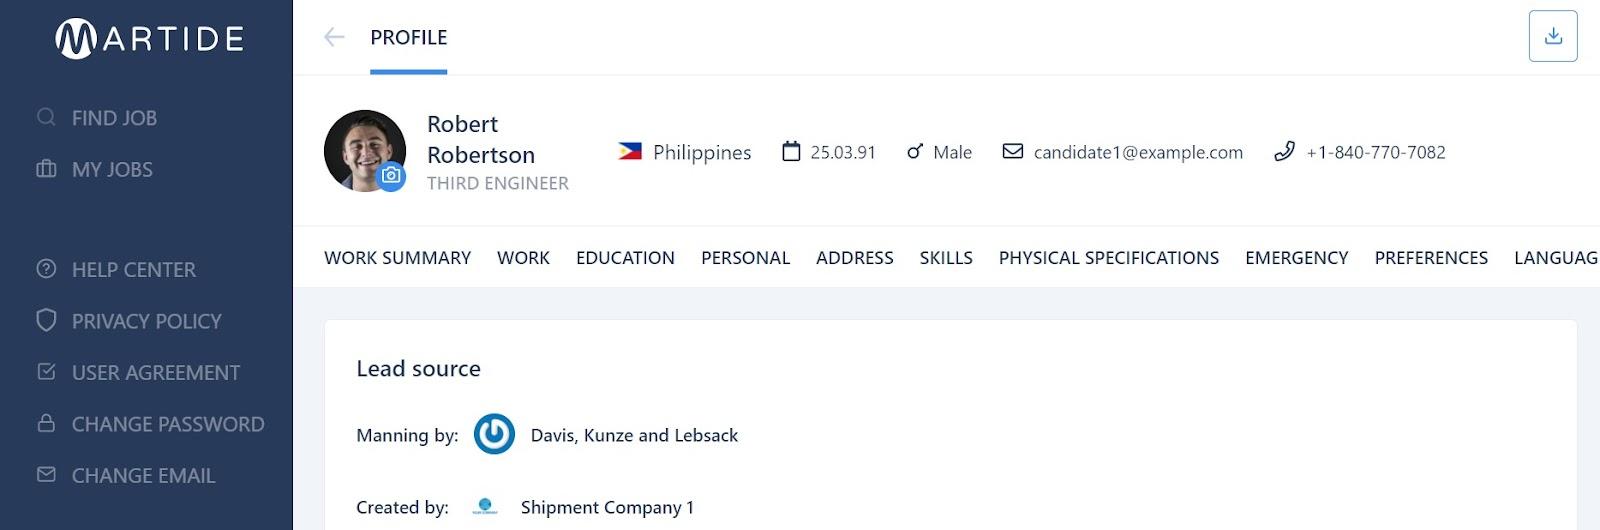 screenshot of a seafarer's profile page.